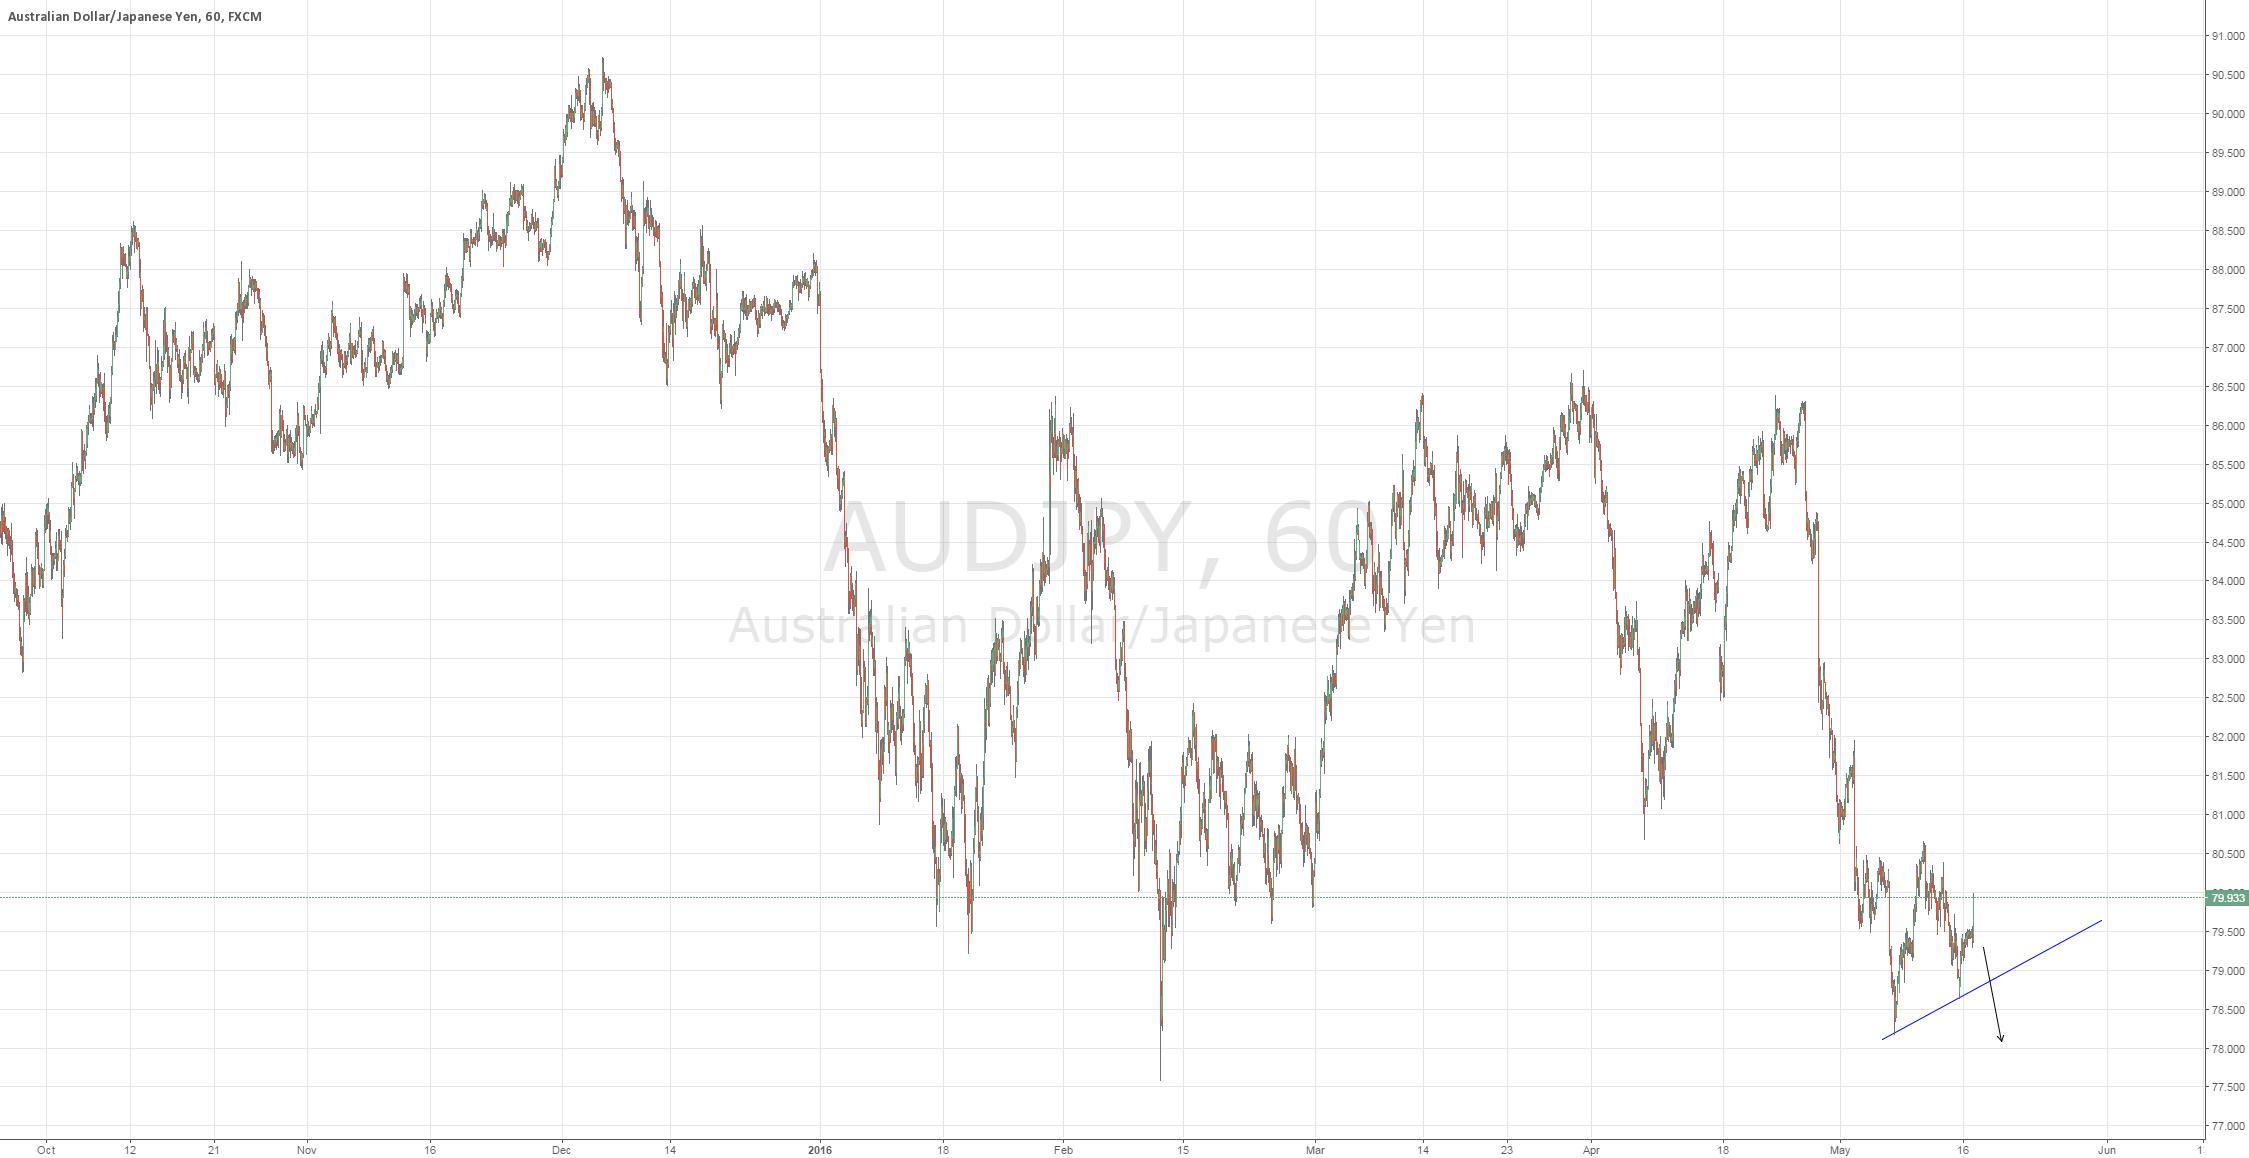 AUDJPY Potential Short Signal